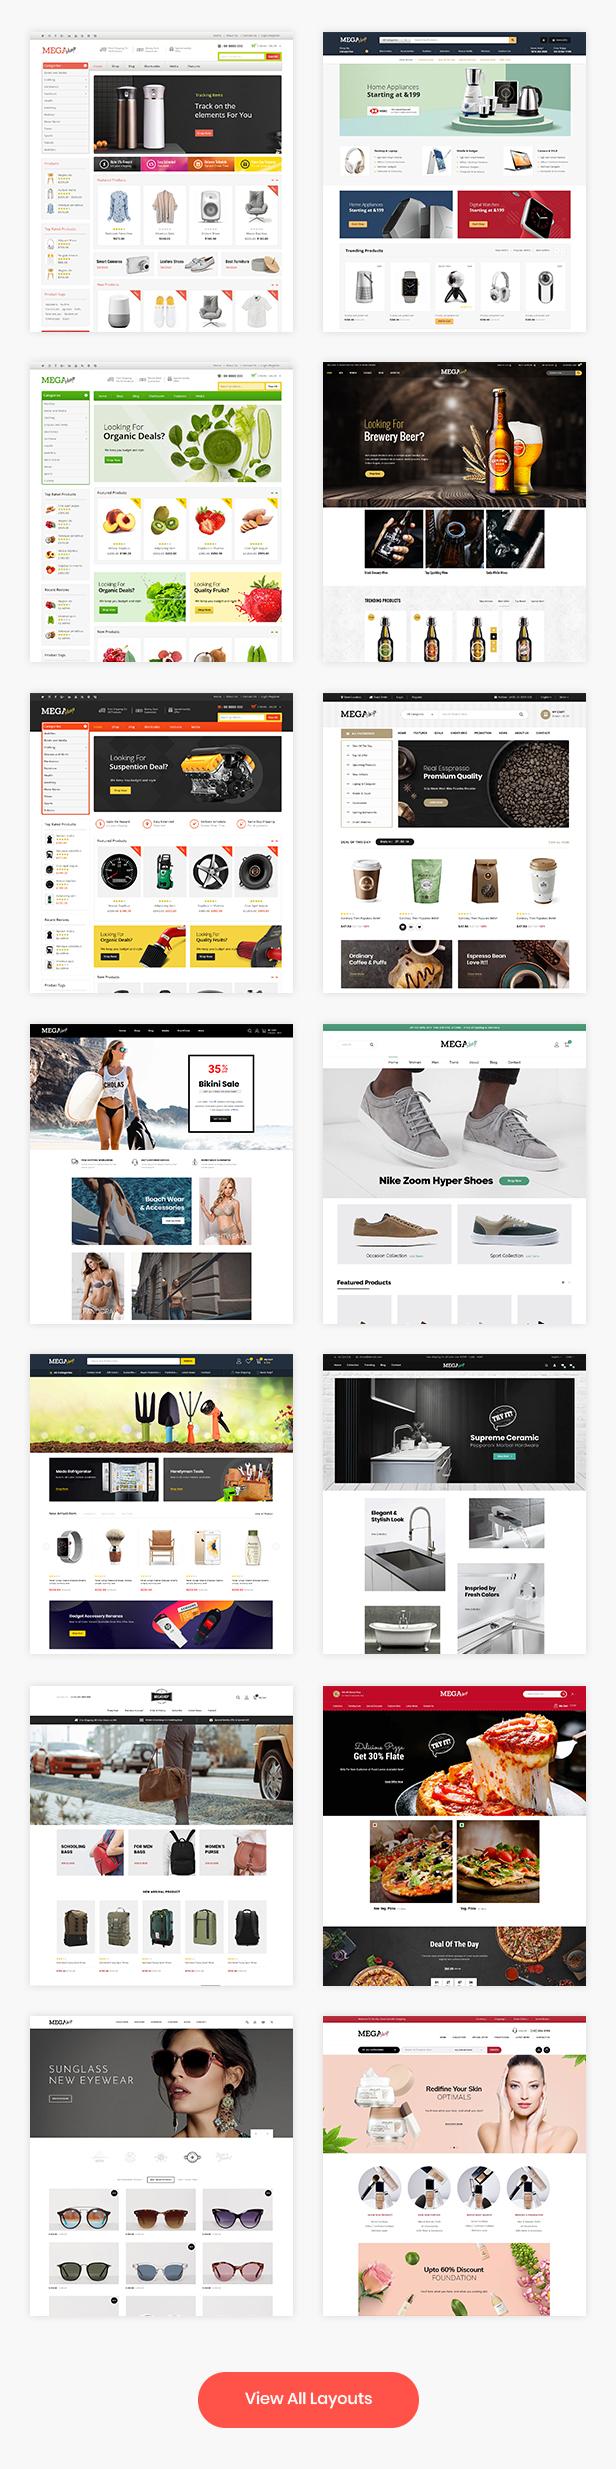 22 - Mega Shop - WooCommerce Responsive Theme